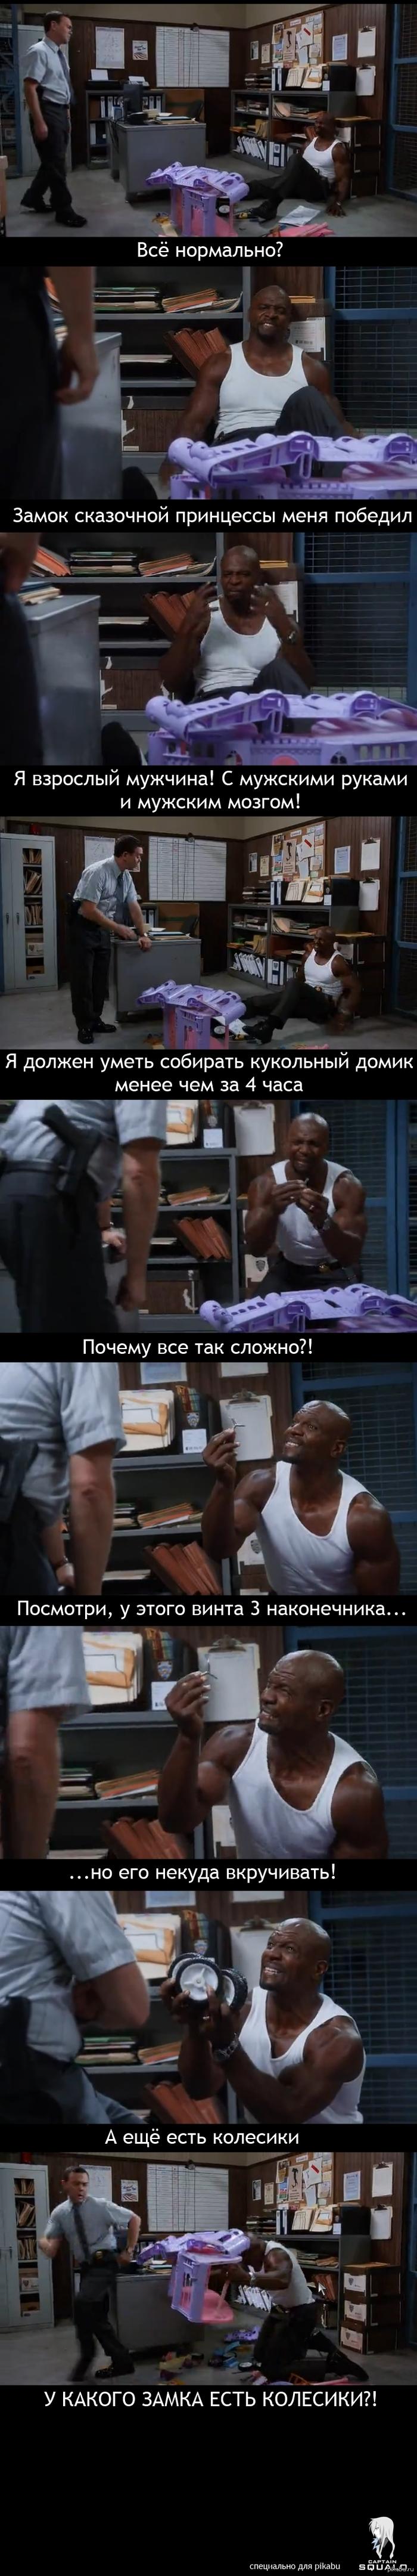 http://s2.pikabu.ru/post_img2/2014/01/26/10/1390749228_1022882586.jpg